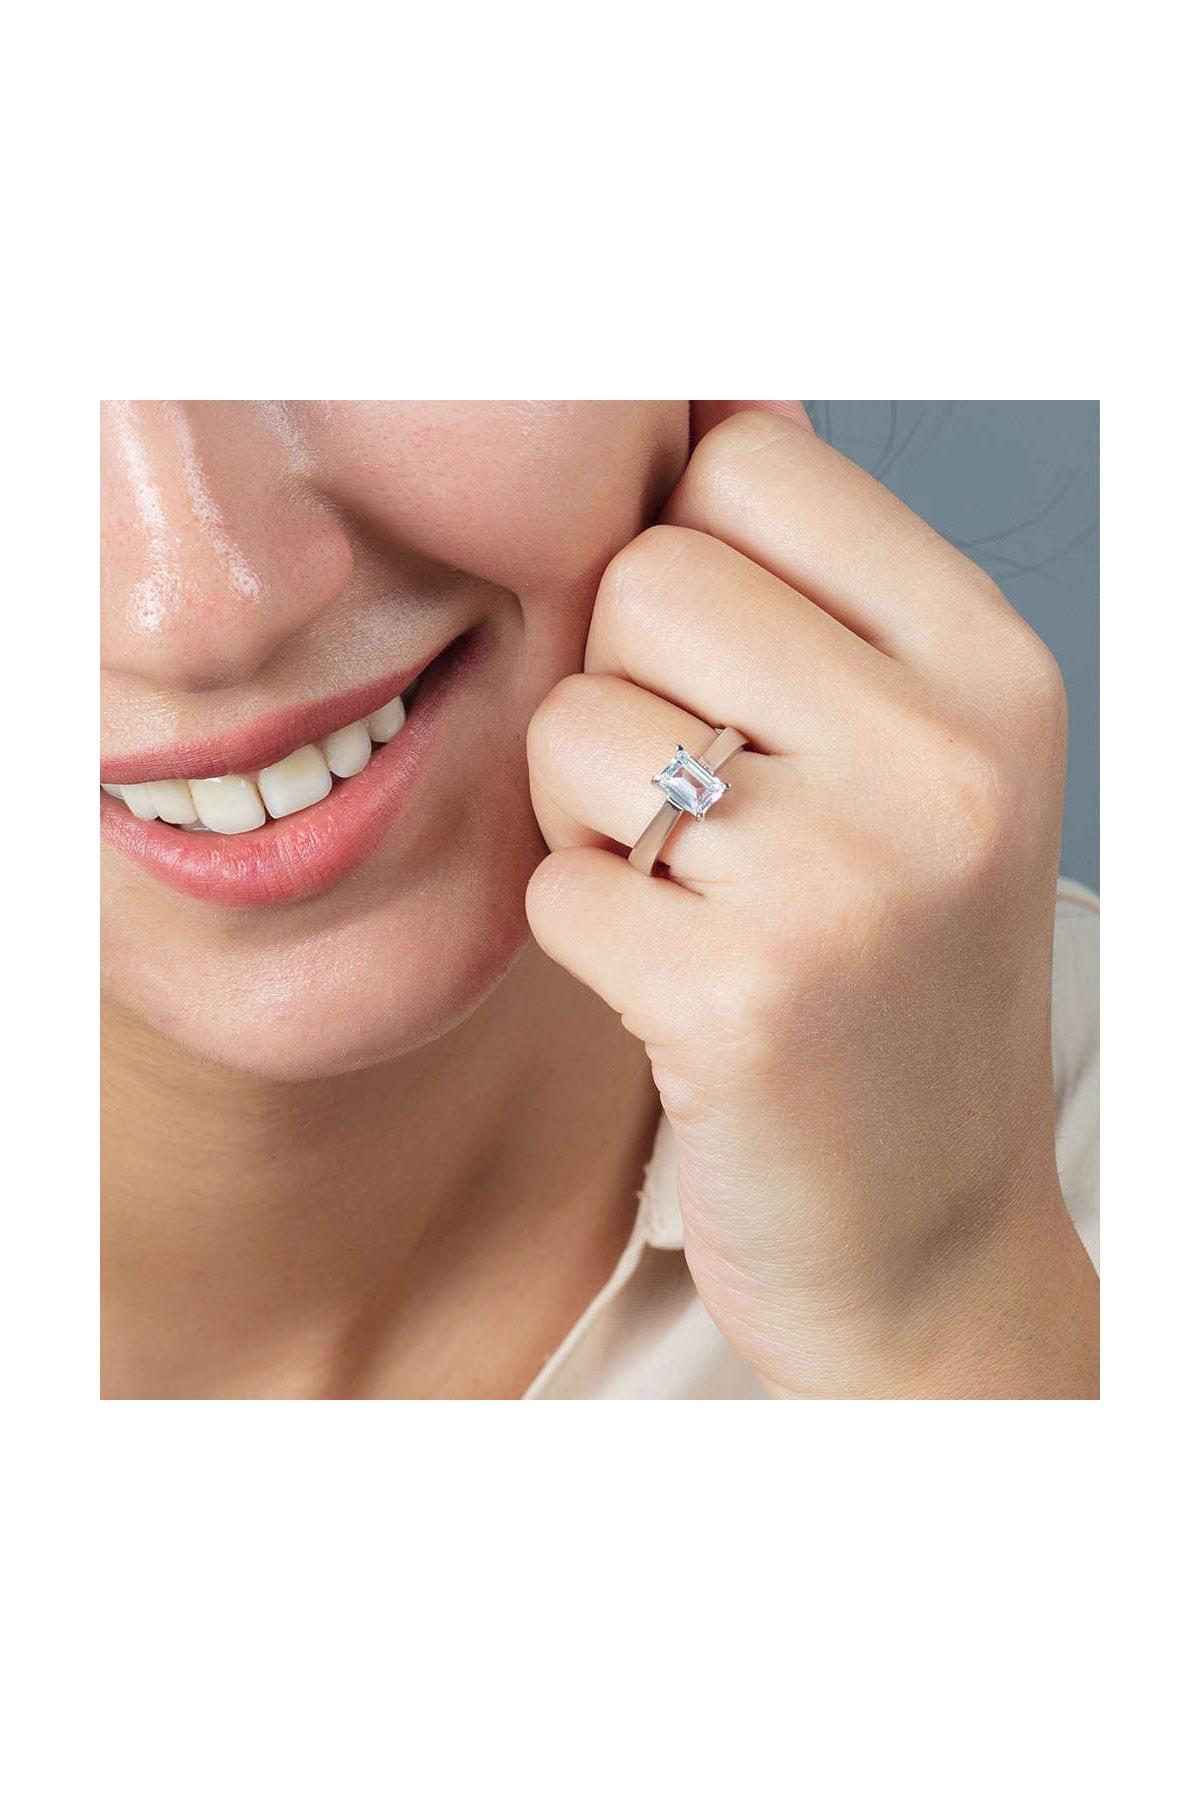 Tesbihane Starlight Diamond Pırlanta Montür Minimal Tasarım 925 Ayar Gümüş Bayan Baget Yüzük 102001792 2